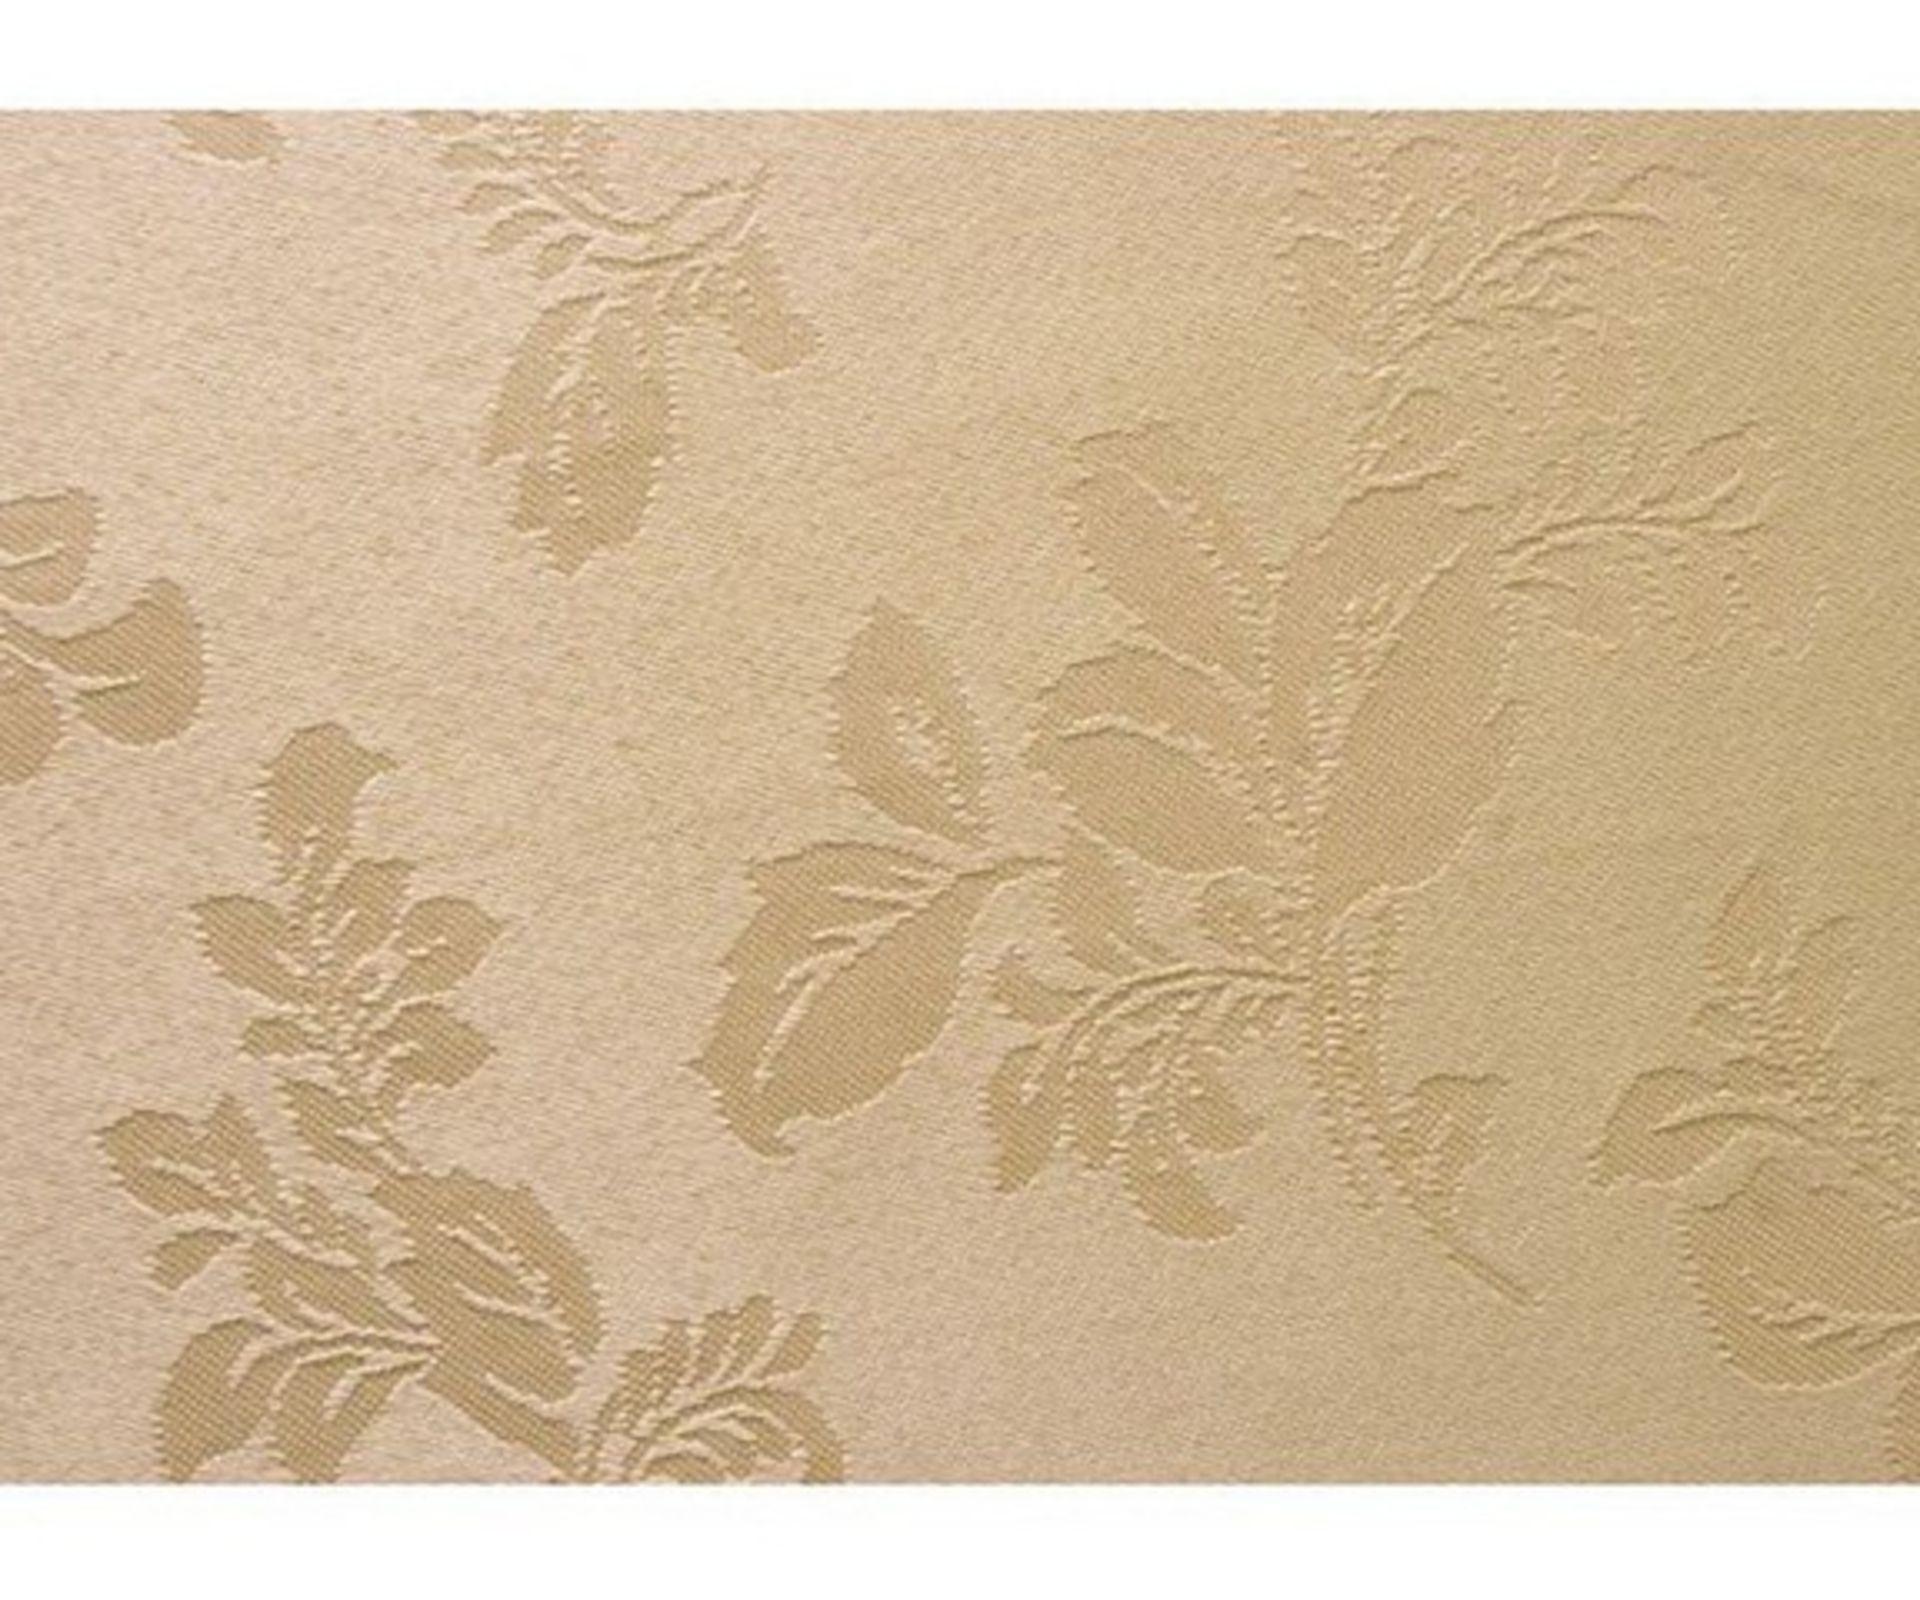 Lot 50114 - V Brand New Luxury Stain Resistant Linen Table Cloth 160 x 210cm Gold - ISP £34.99 (islshop-UK)